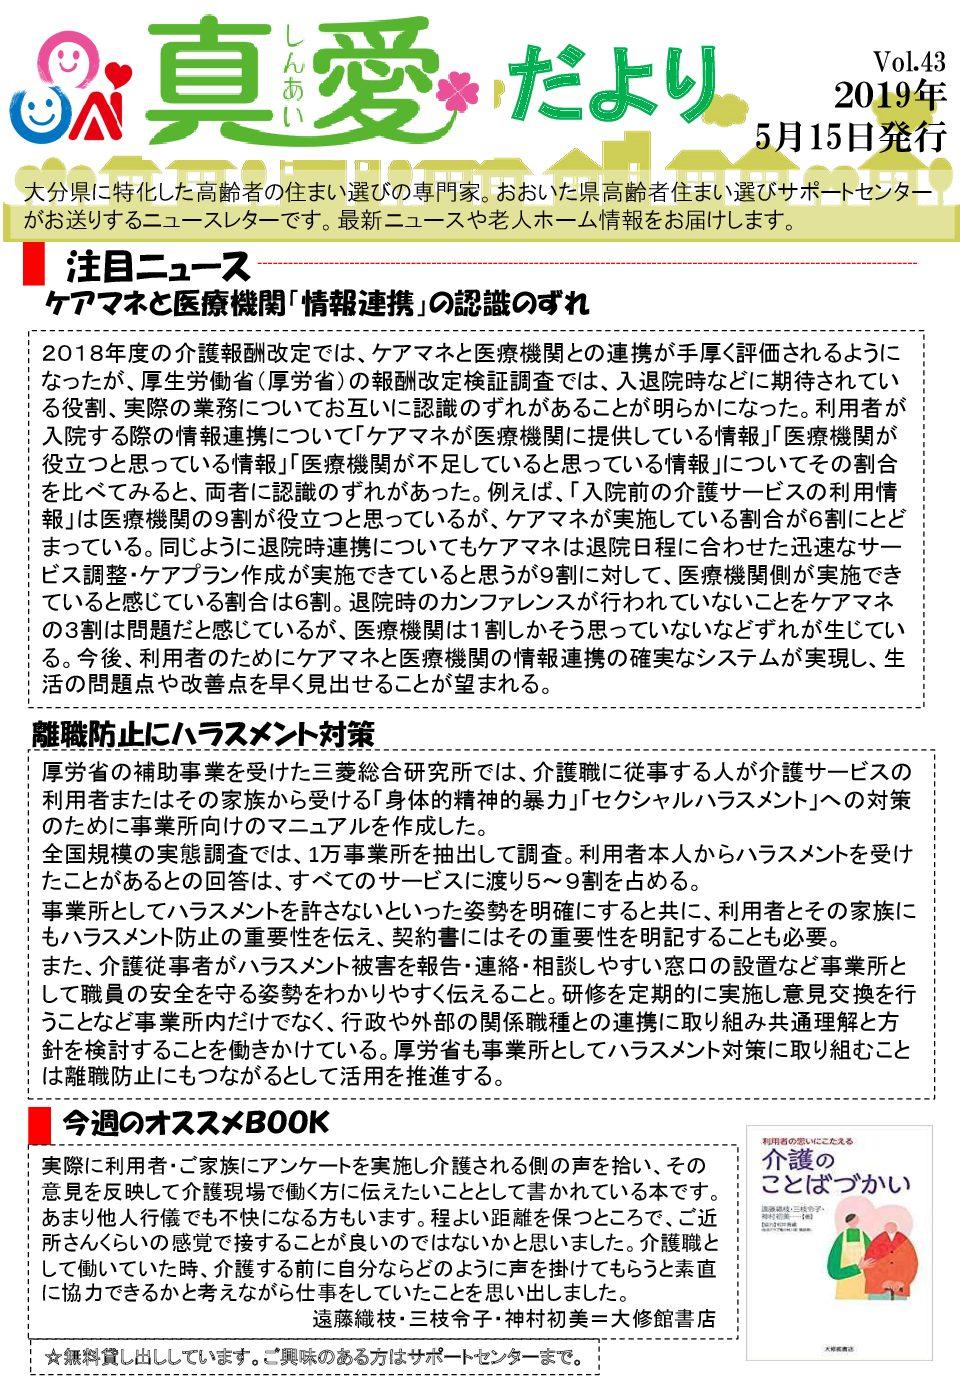 【Vol.43】 2019.05.15発行